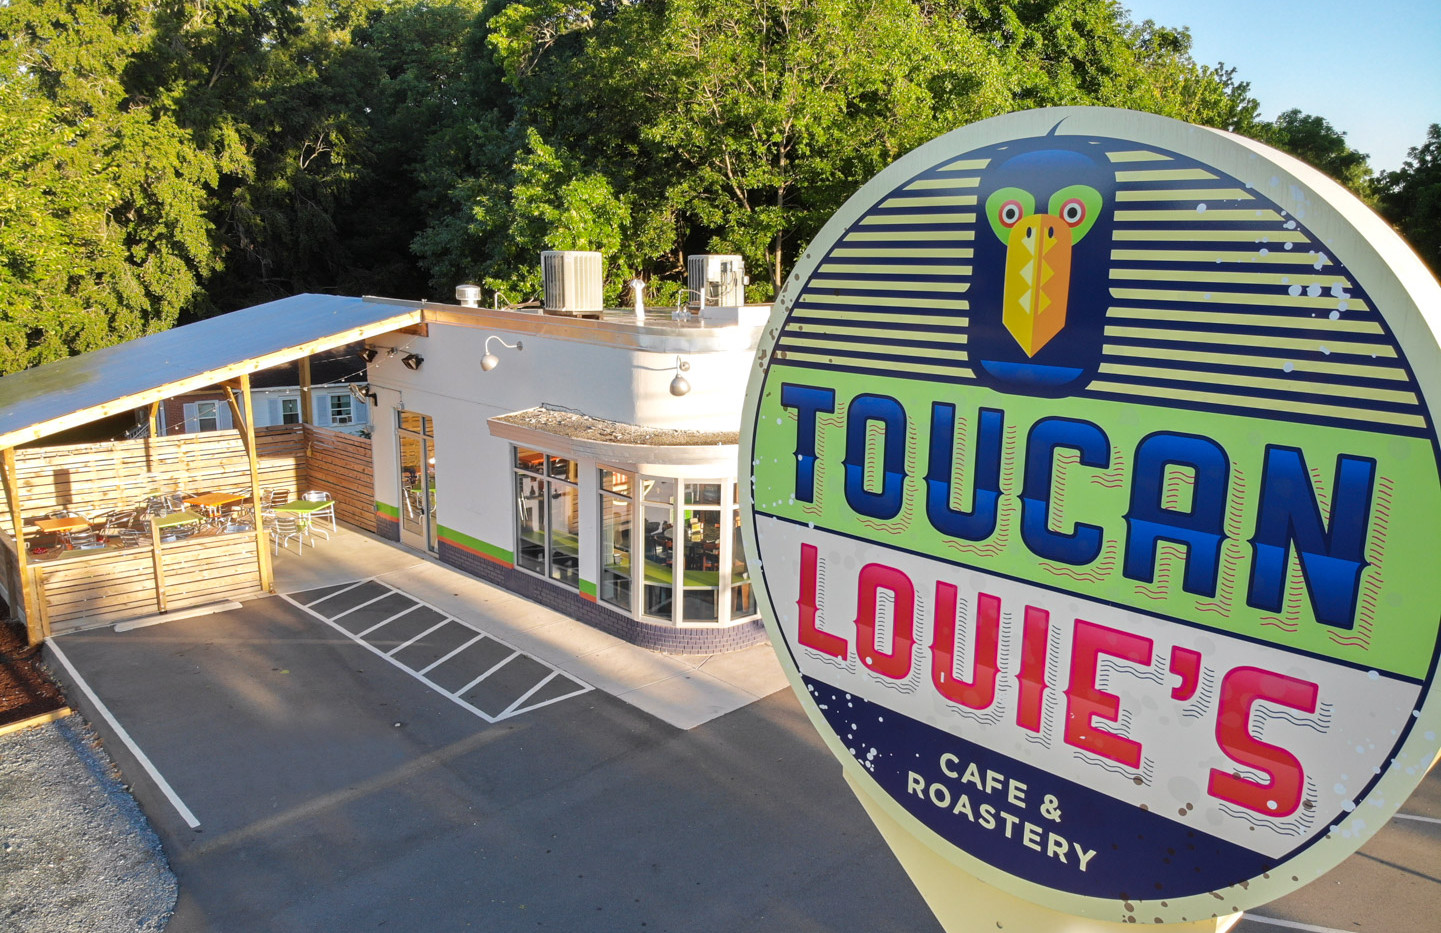 Toucan Louie's Exterior